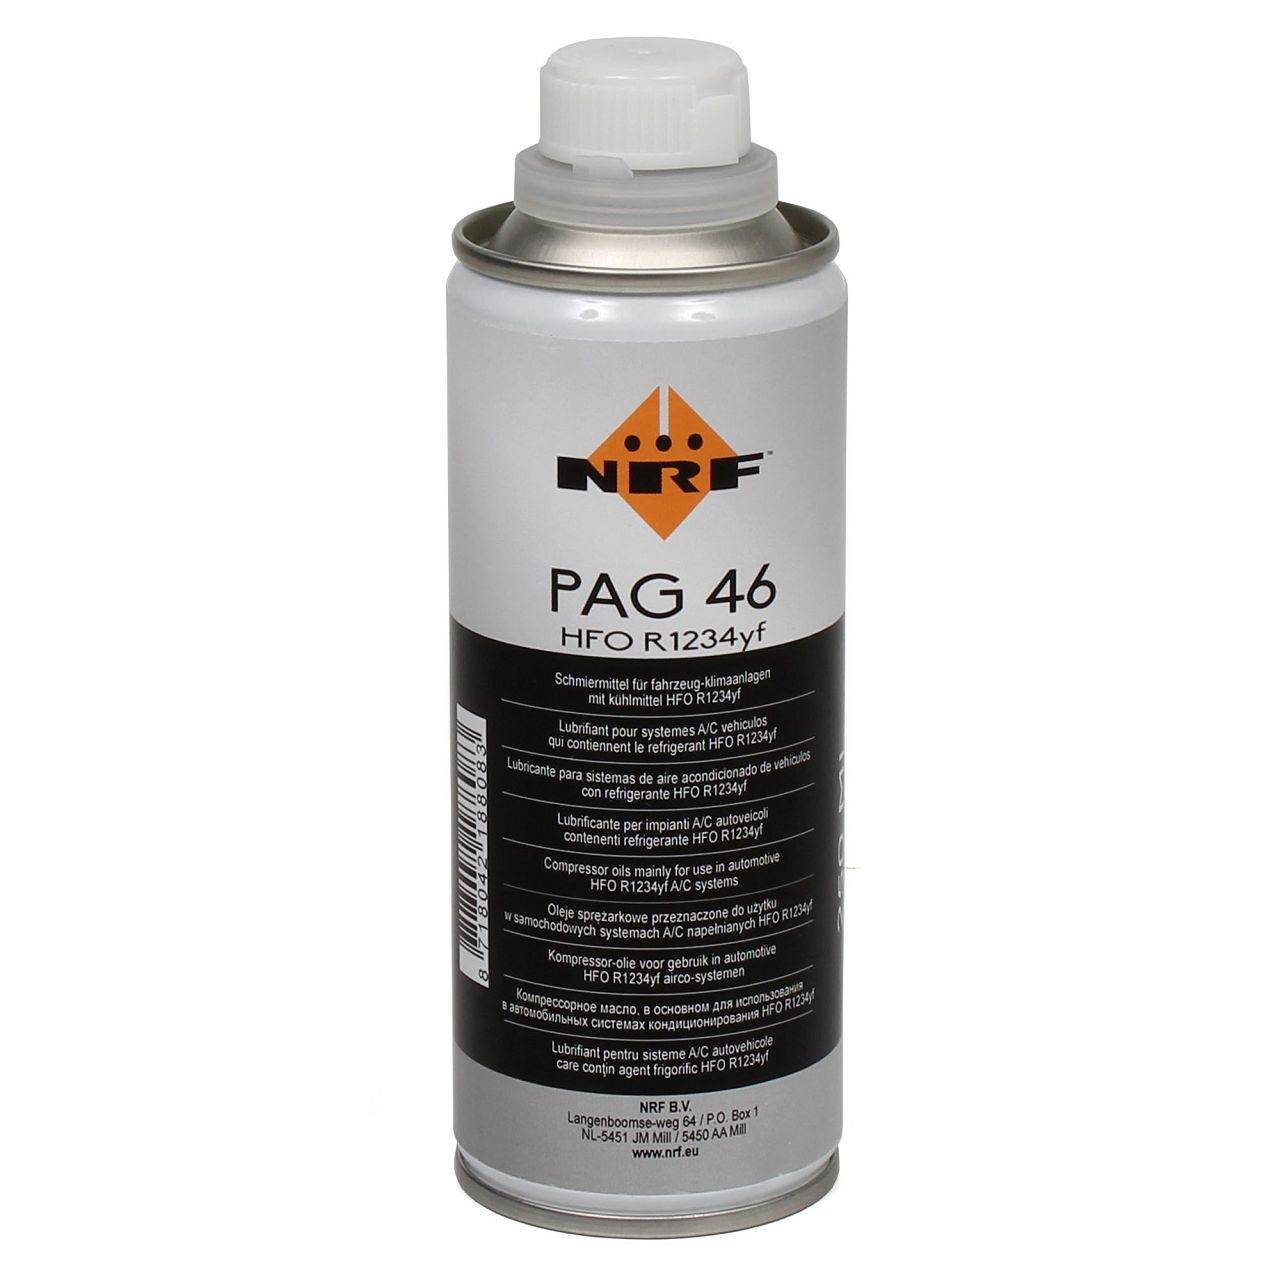 NRF 38837 Kompressor-ÖL Schmiermittel PAG 46 mit Kühlmittel HFO R1234yf 250ml